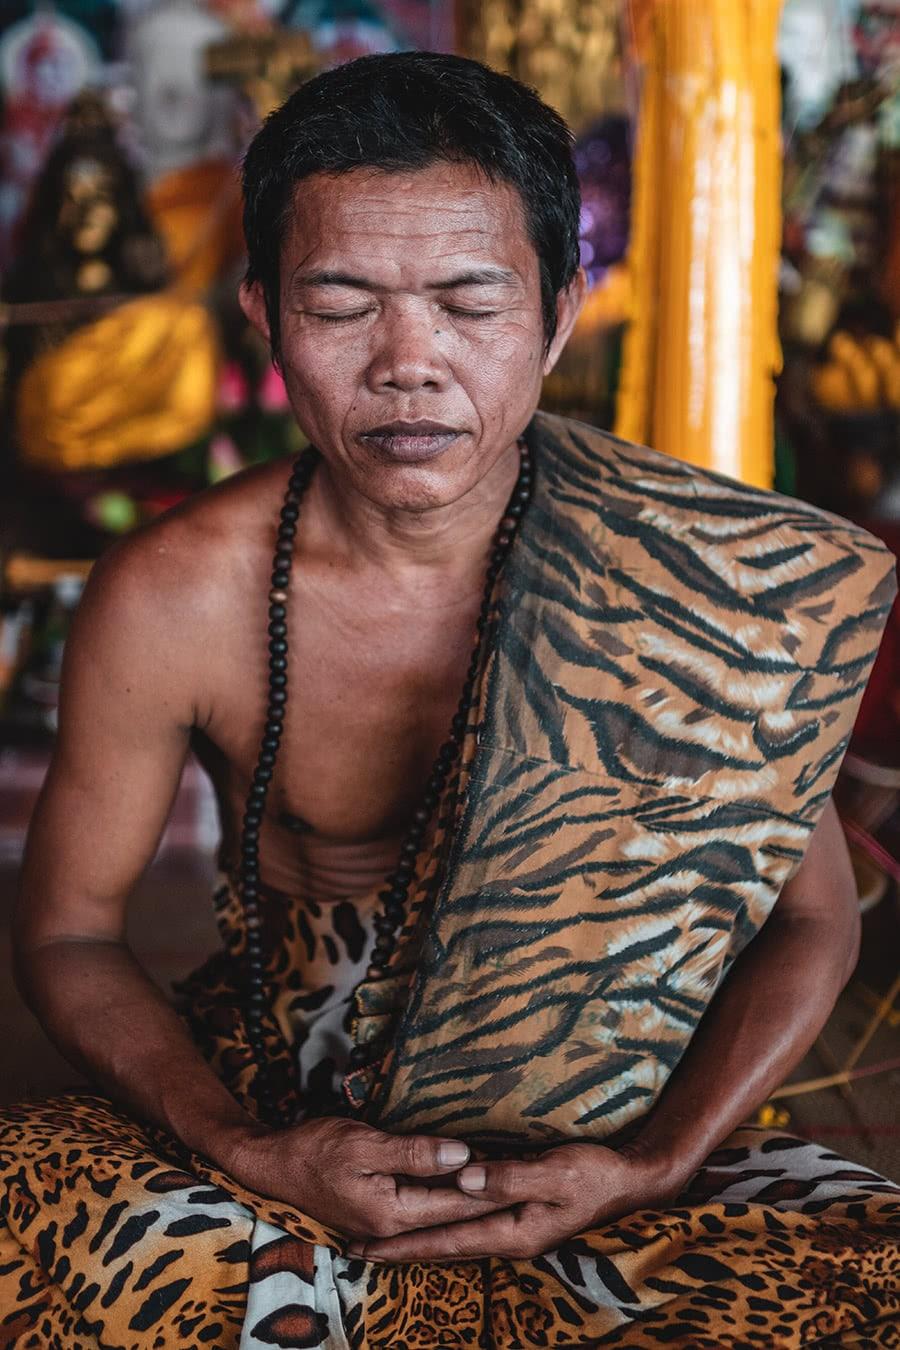 Cave monk at Phnom Kulen, Cambodia